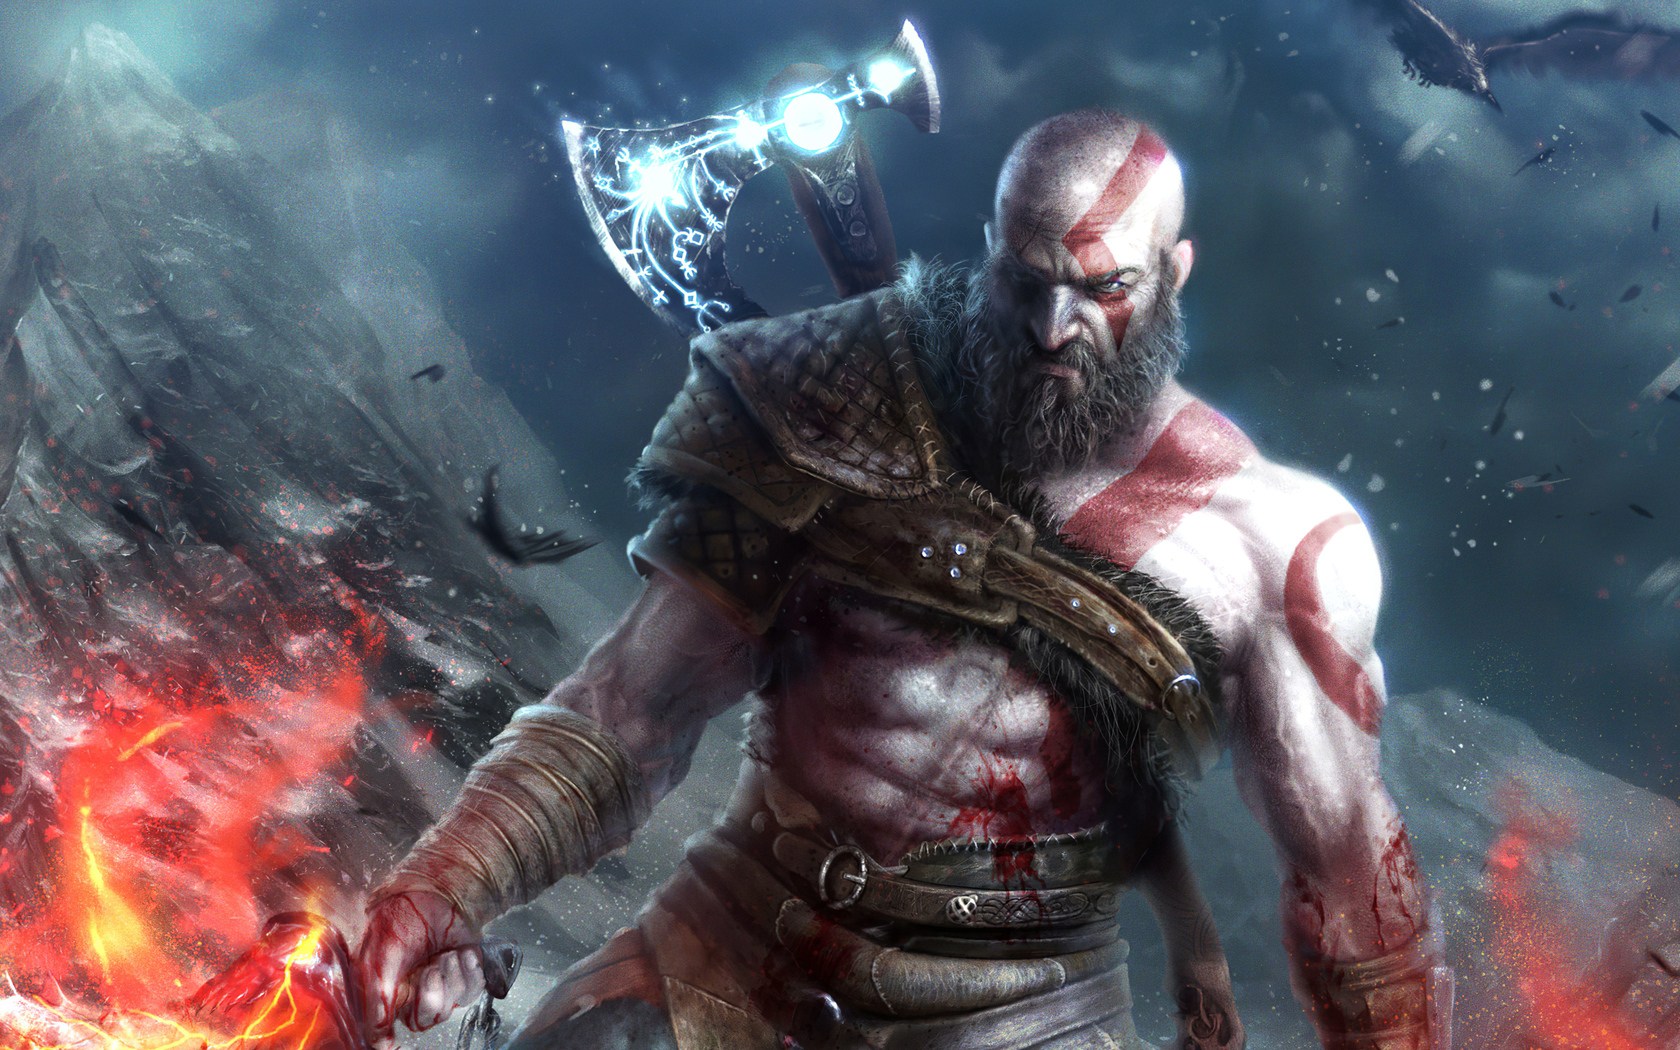 kratos-god-of-war-art-4k-yk.jpg